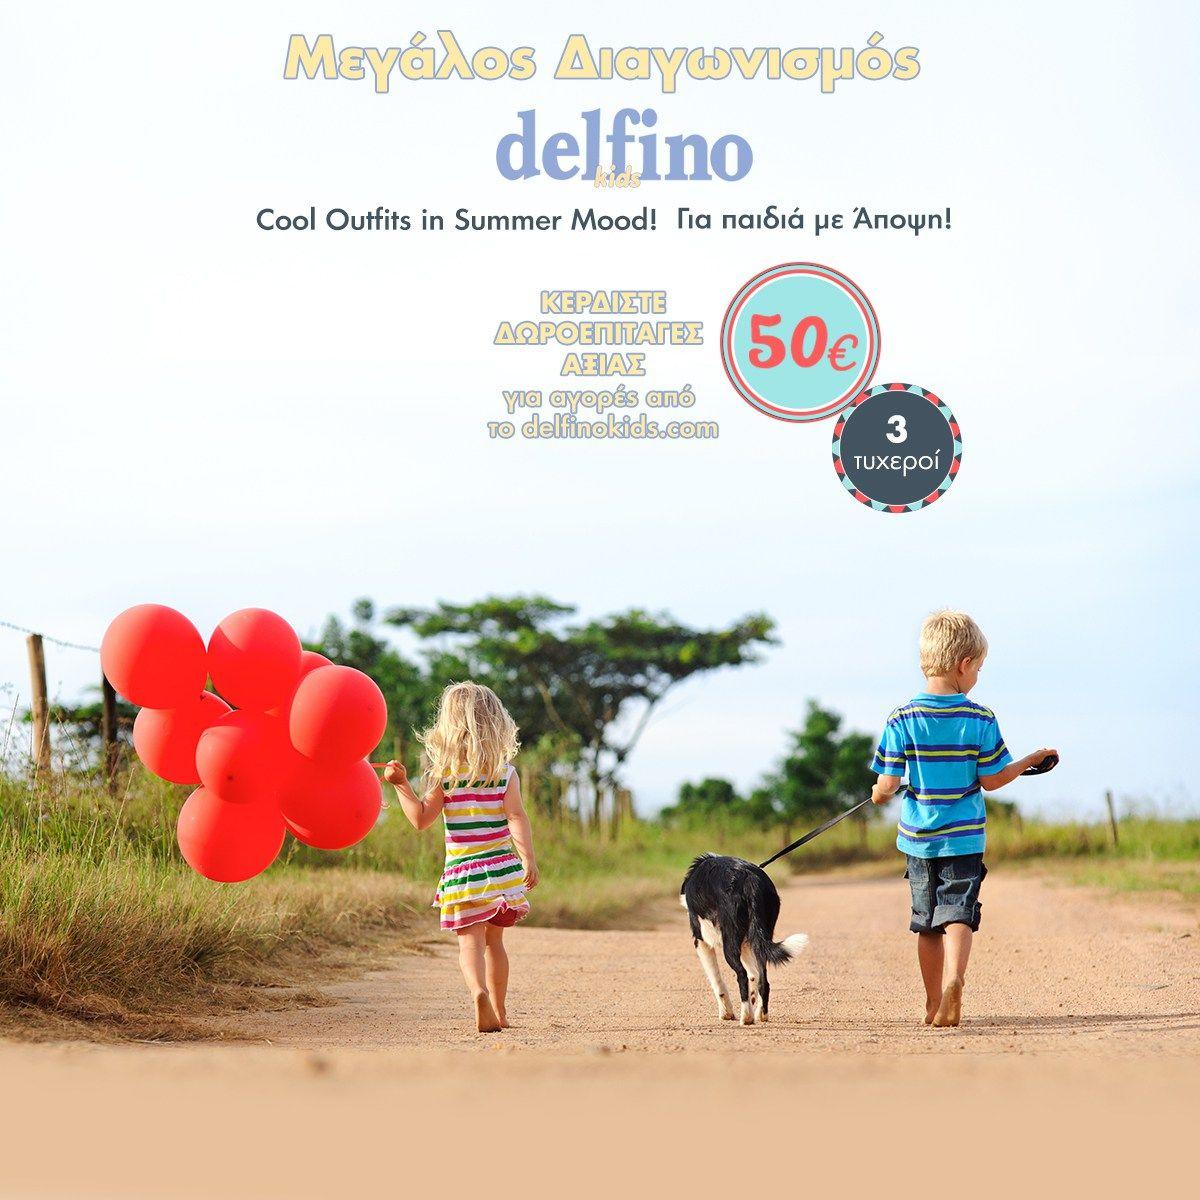 2e3740d847a Διαγωνισμός delfino kids για δωροεπιταγές αξίας 50€ σε τρεις (3) τυχερούς! -